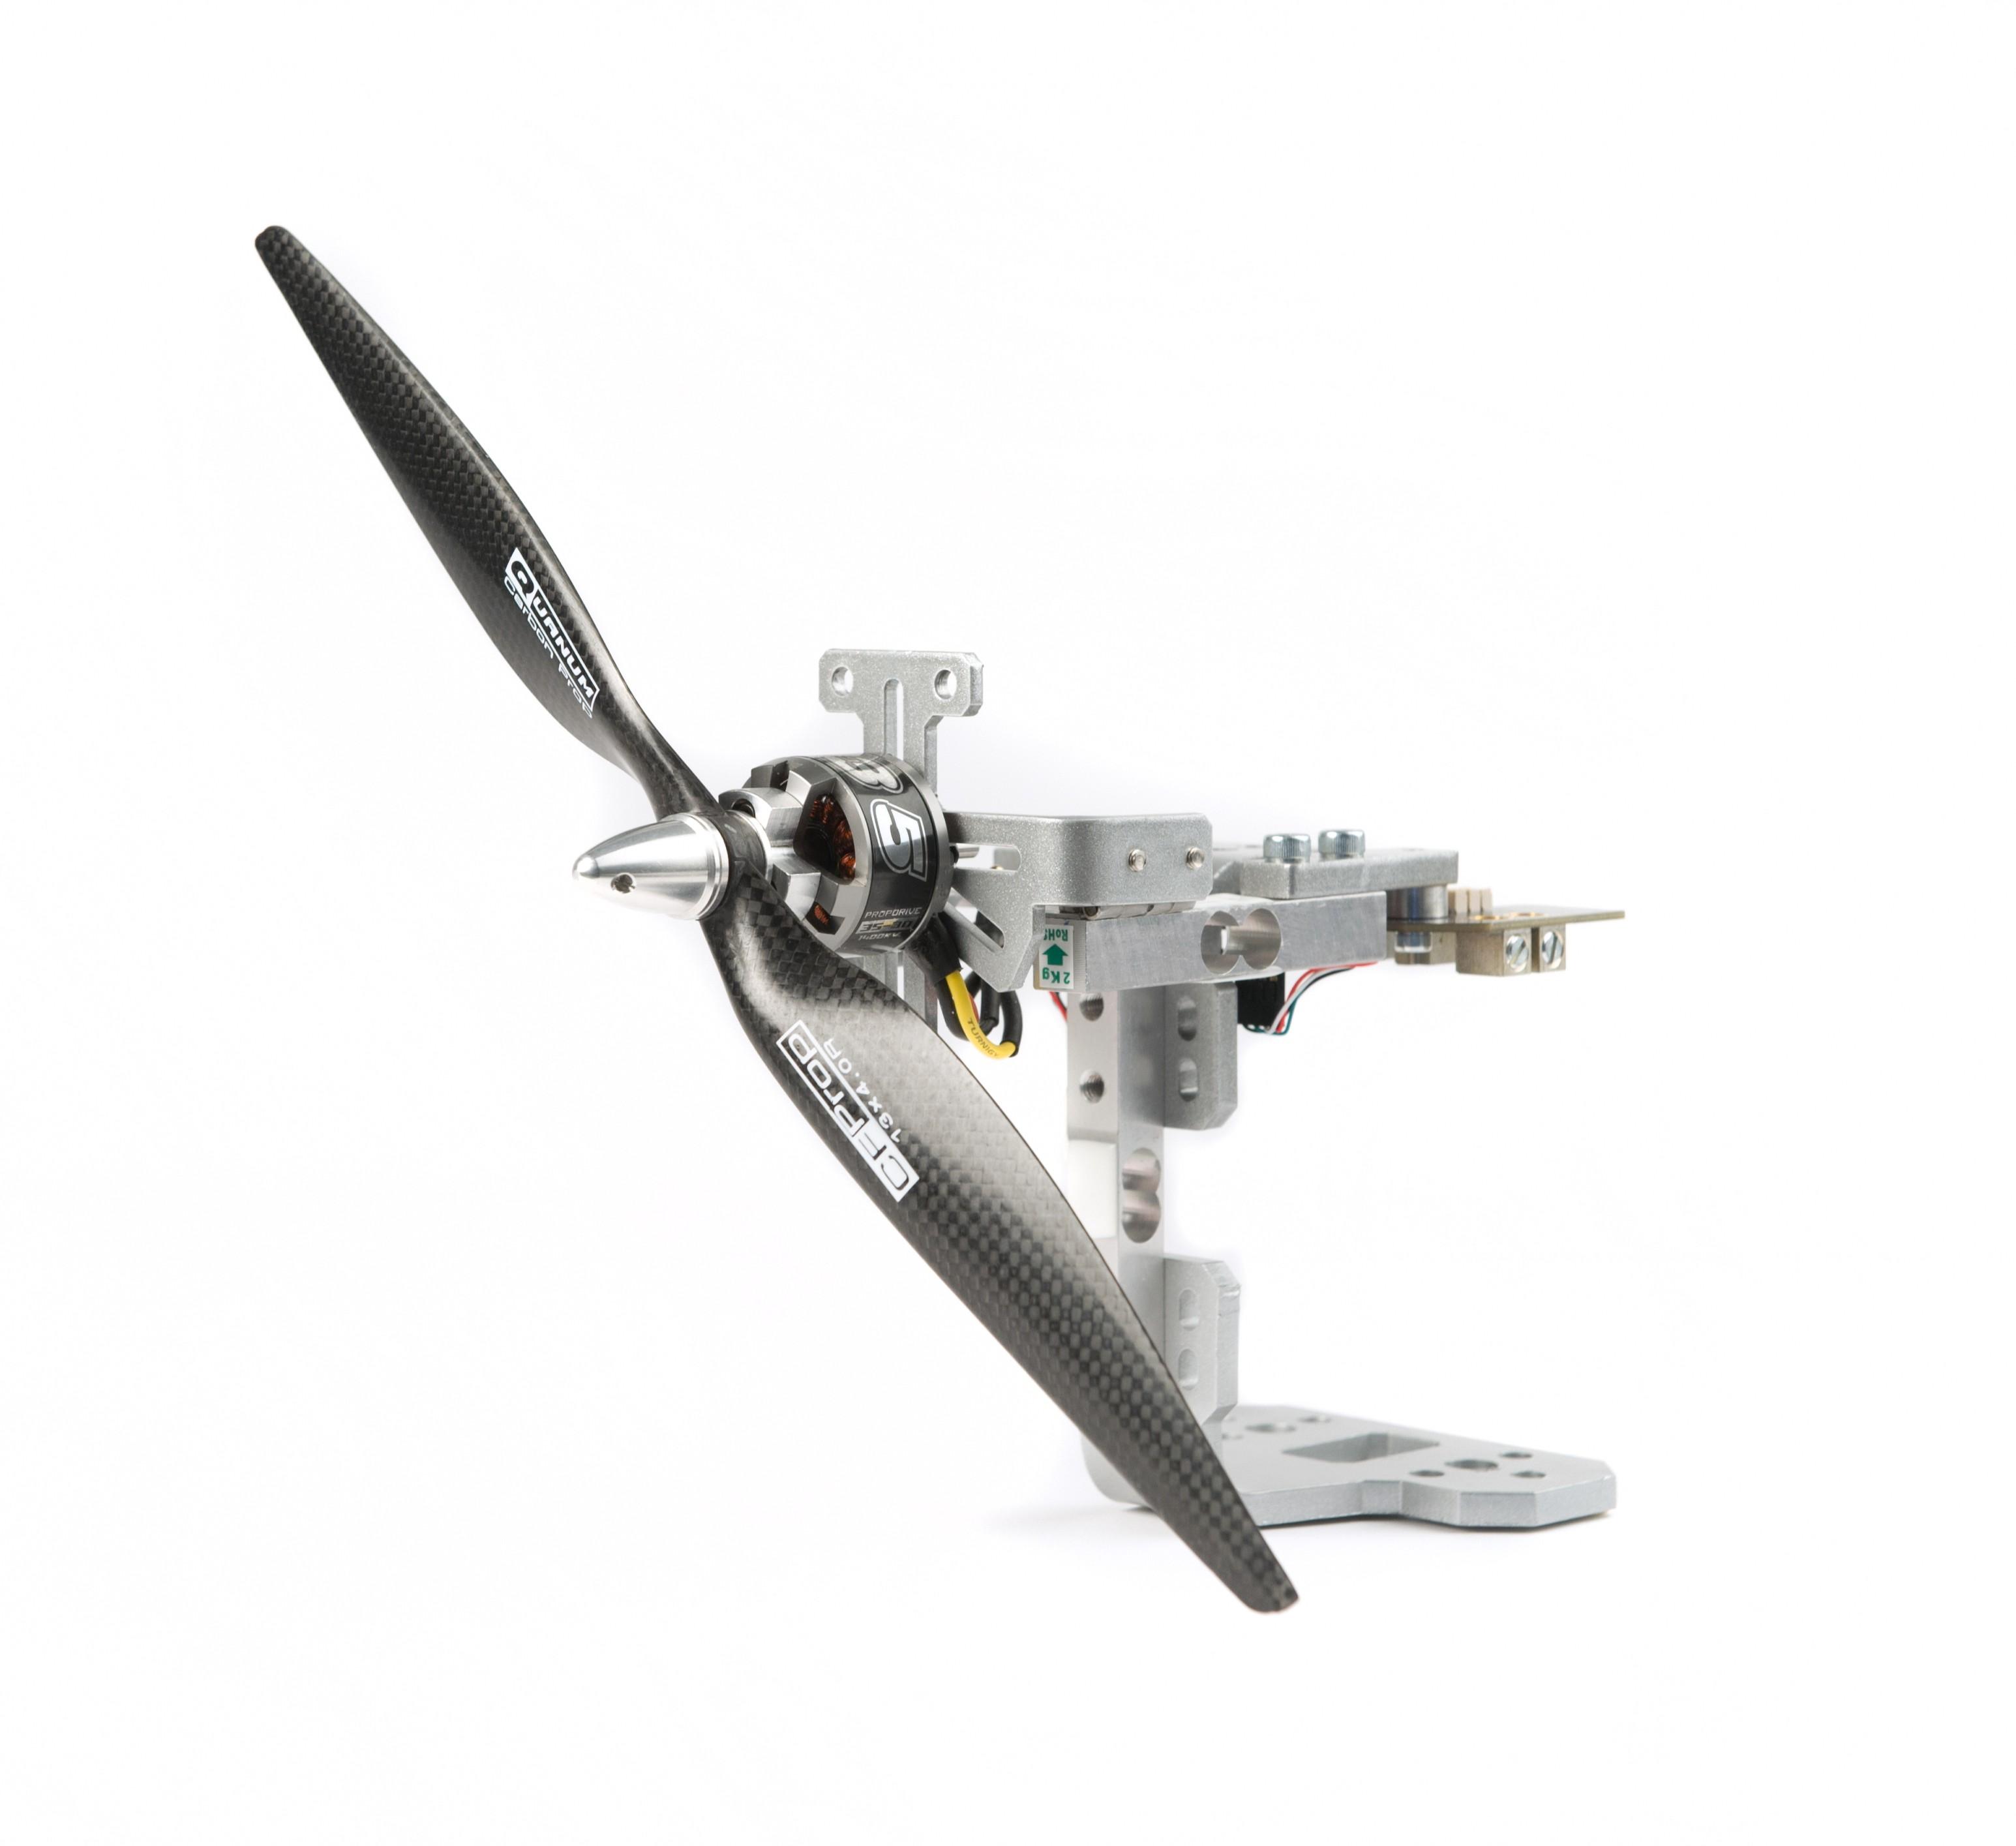 Series 1780 single motor